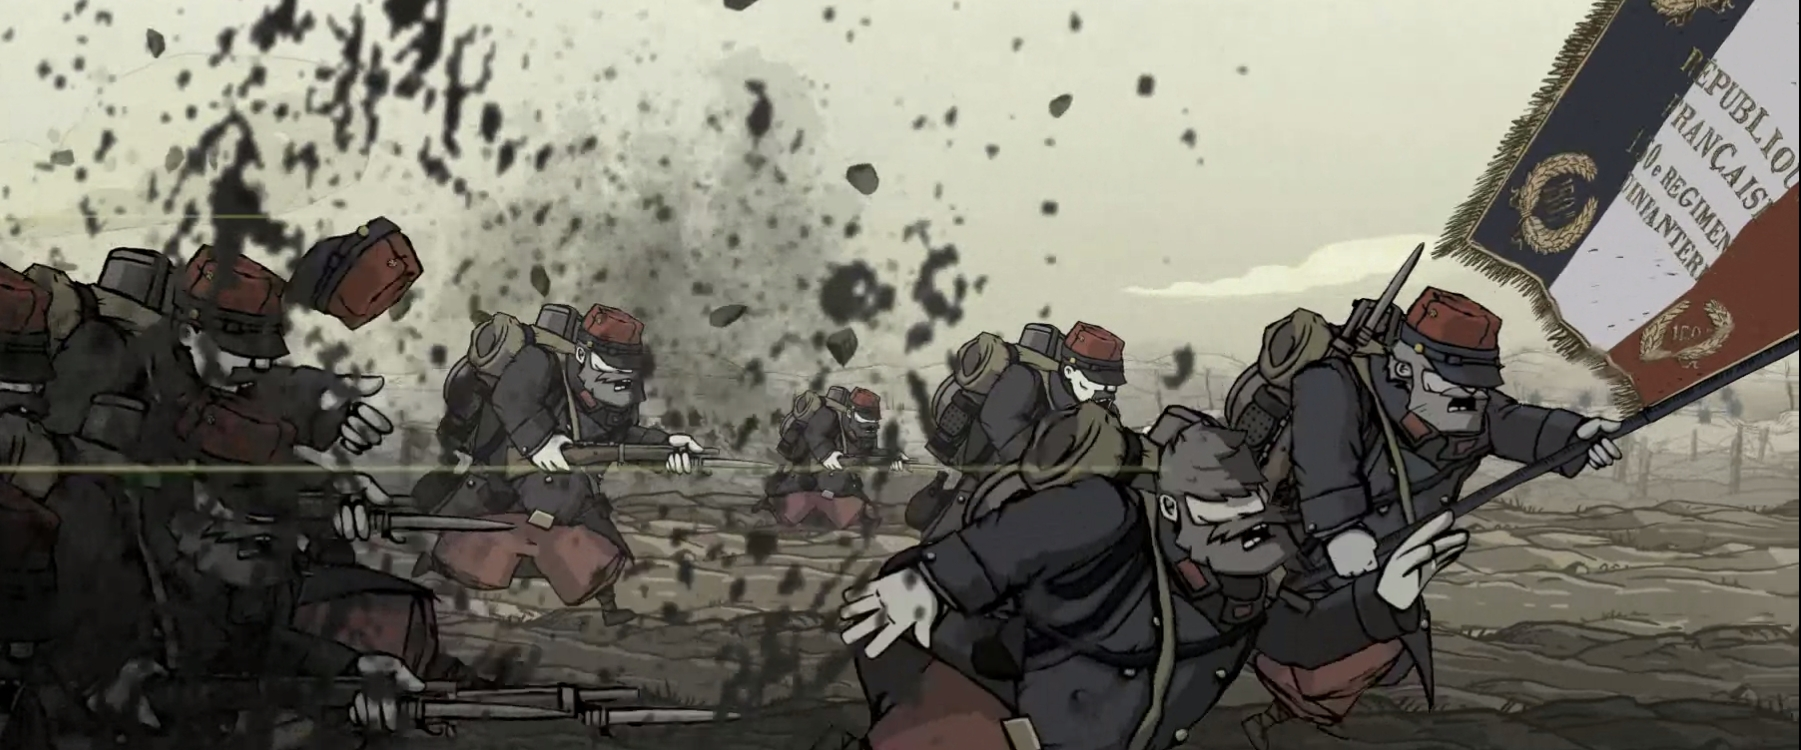 Valiant-Hearts-The-Great-War-Franzosen-im-Angriff.jpg